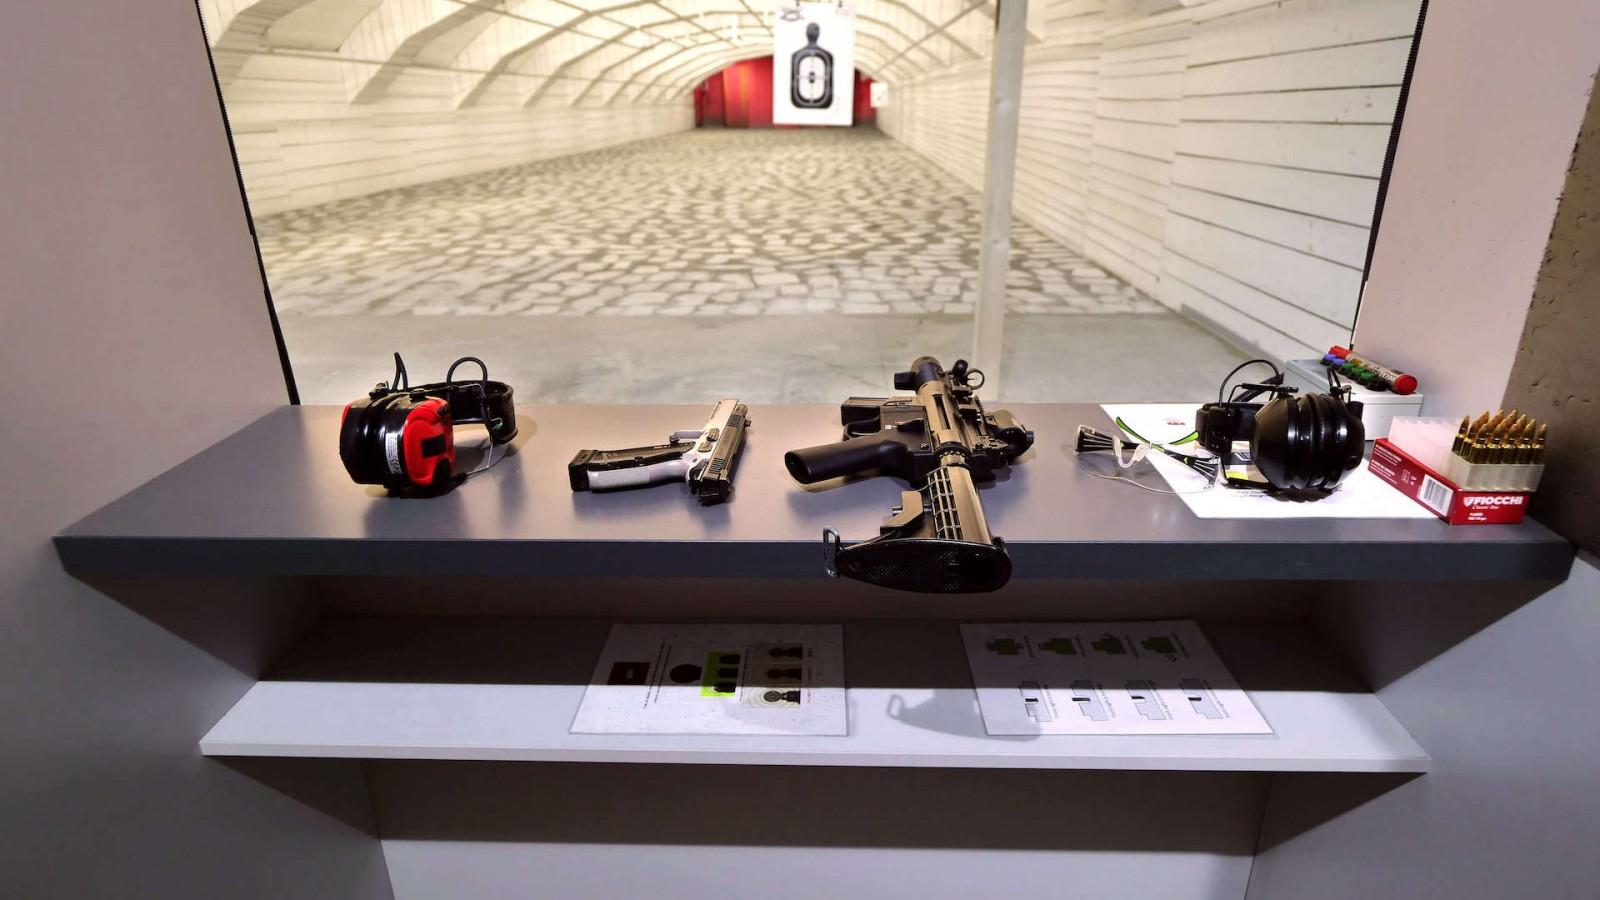 Tir cu arma Poligon Broz Guns